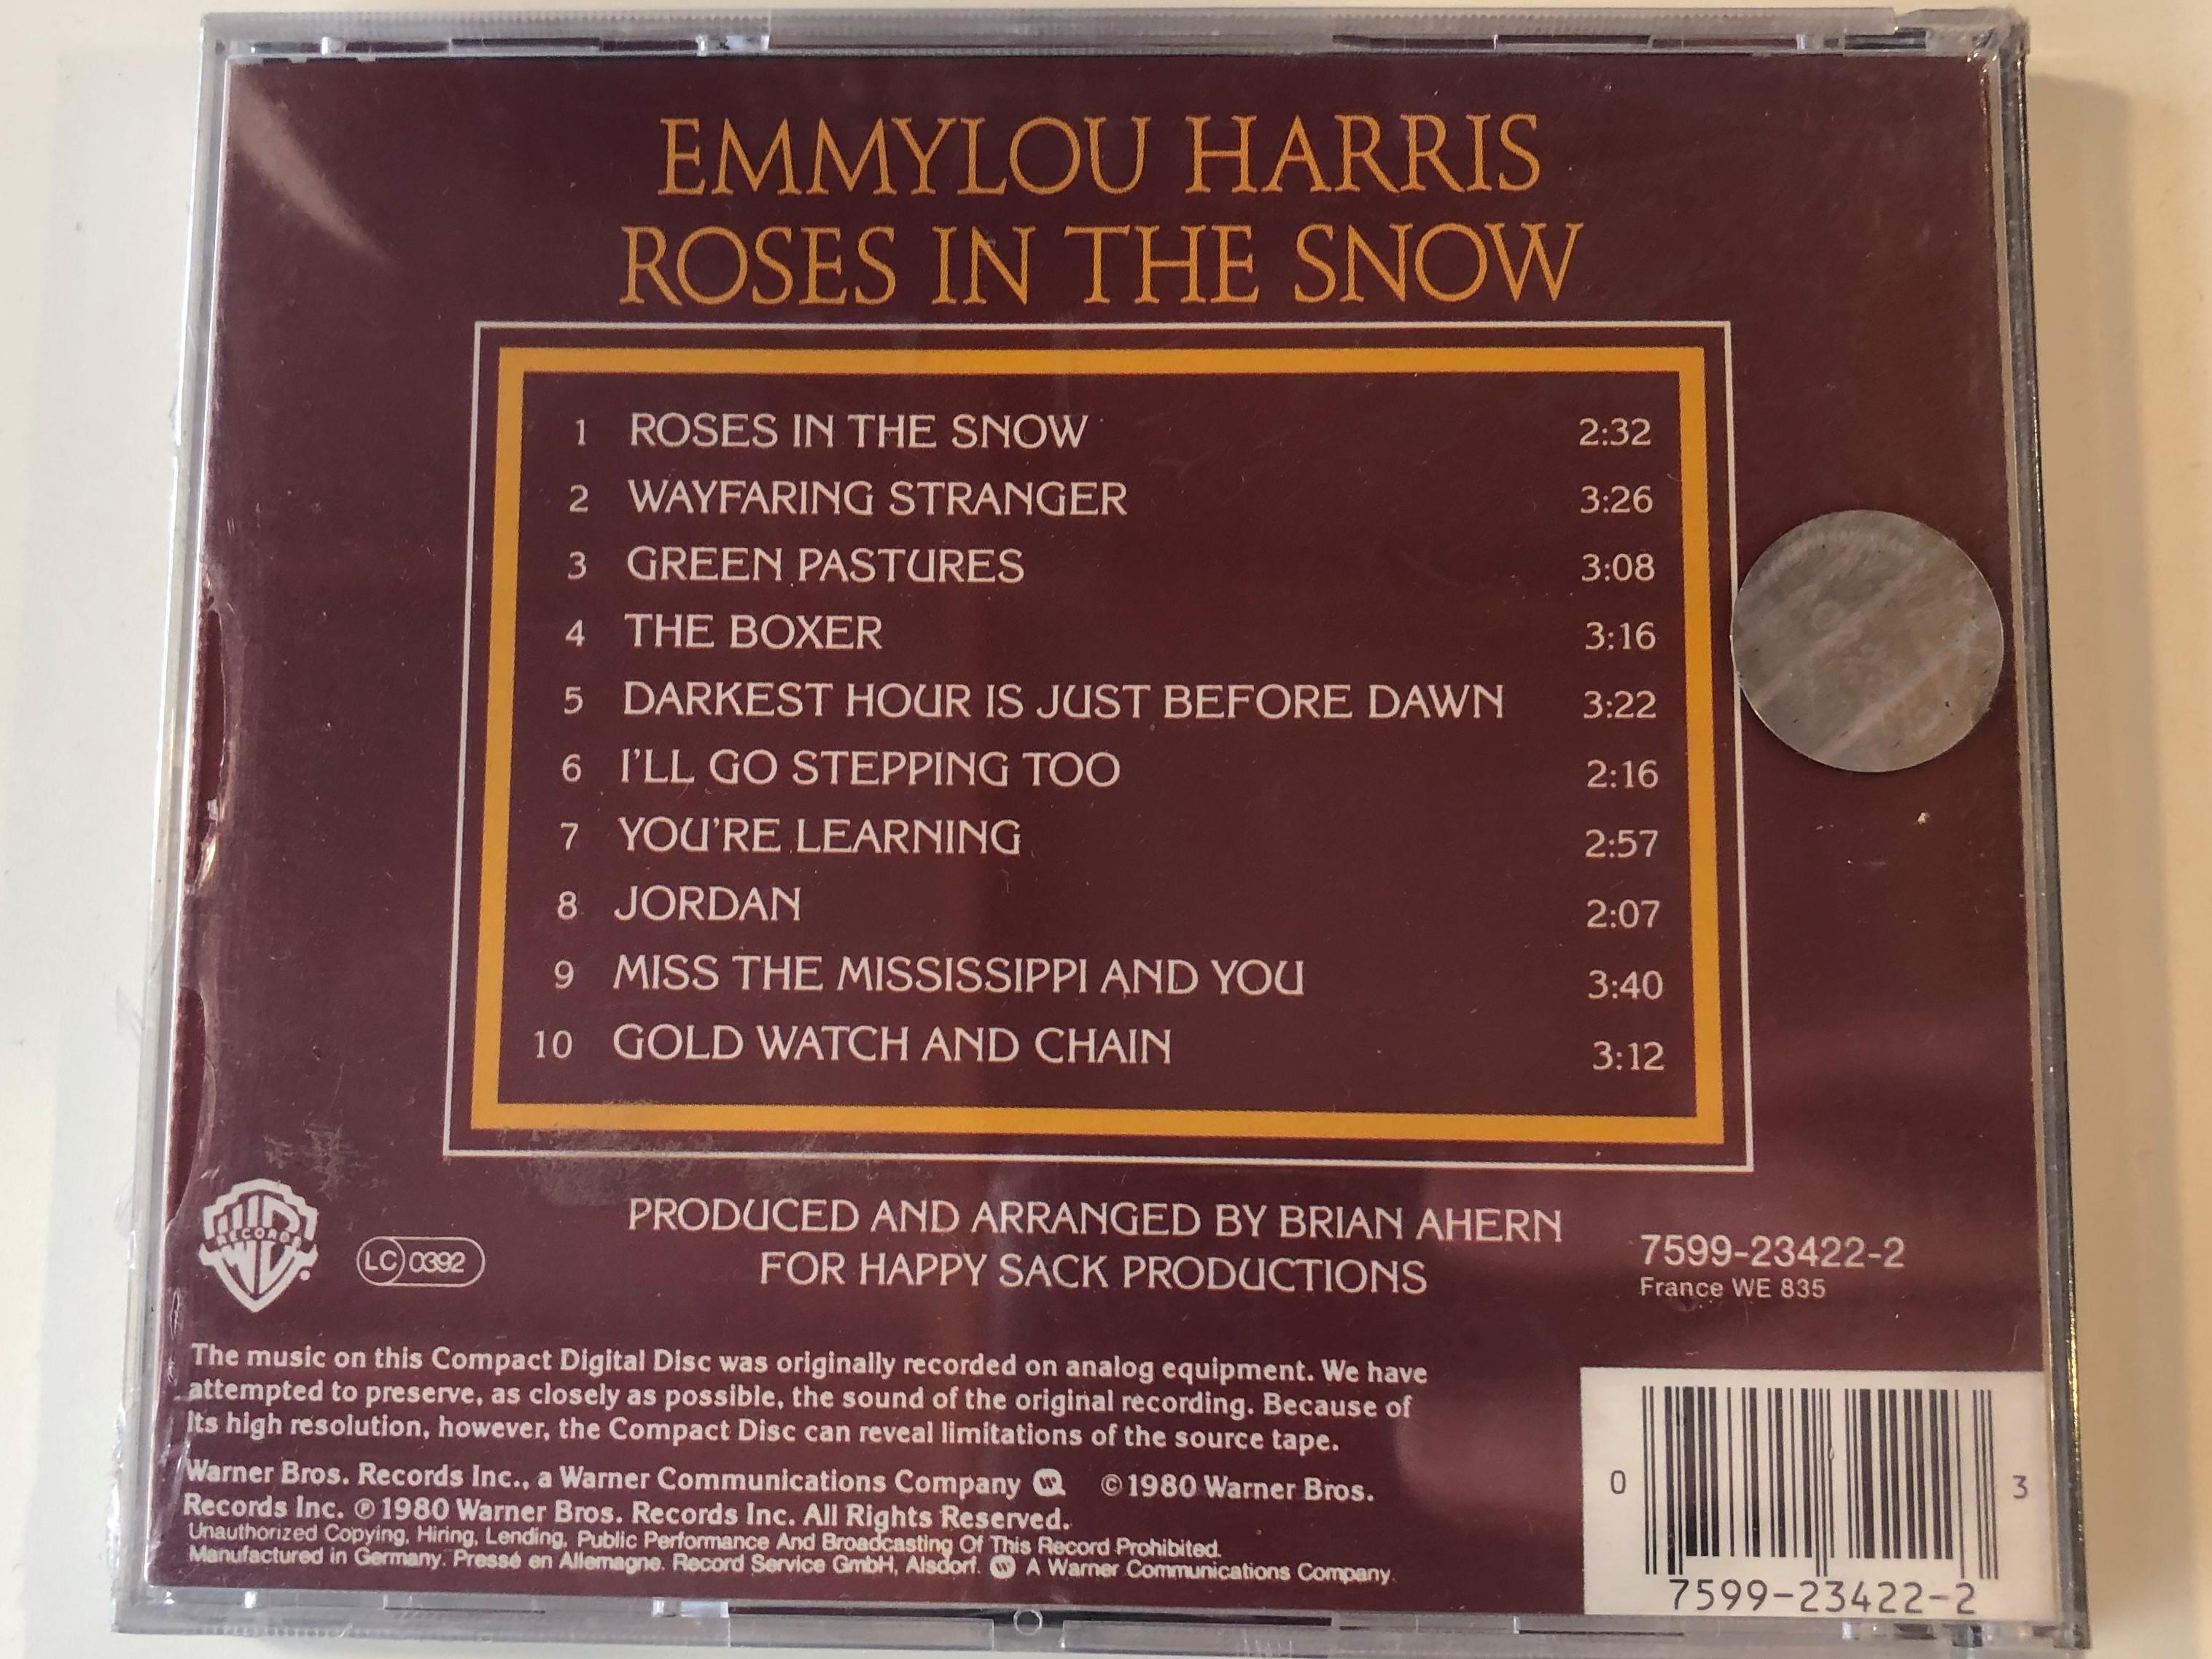 emmylou-harris-roses-in-the-snow-warner-bros.-records-audio-cd-7599-23422-2-2-.jpg